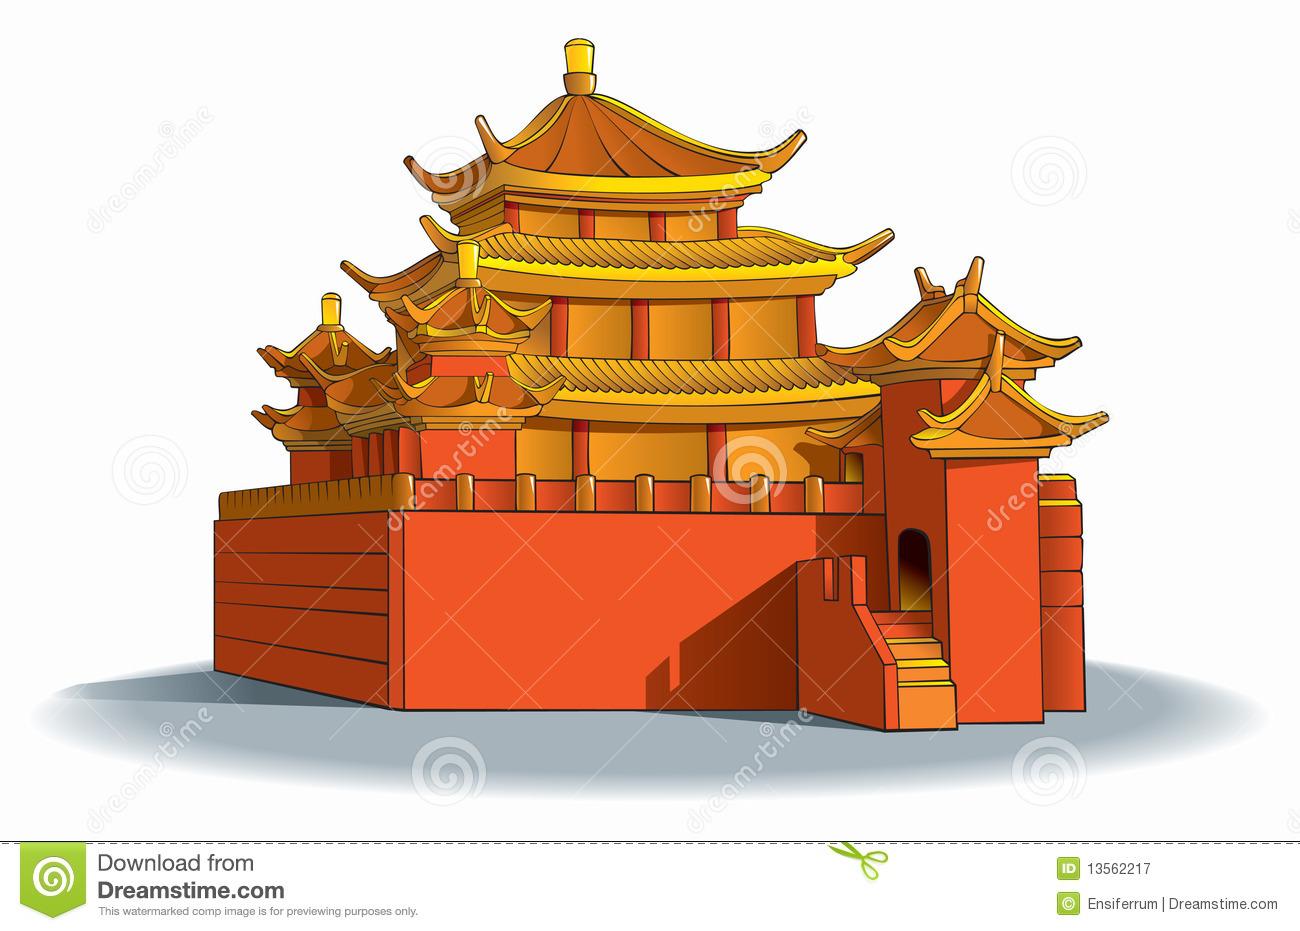 Pagoda clipart #1, Download drawings